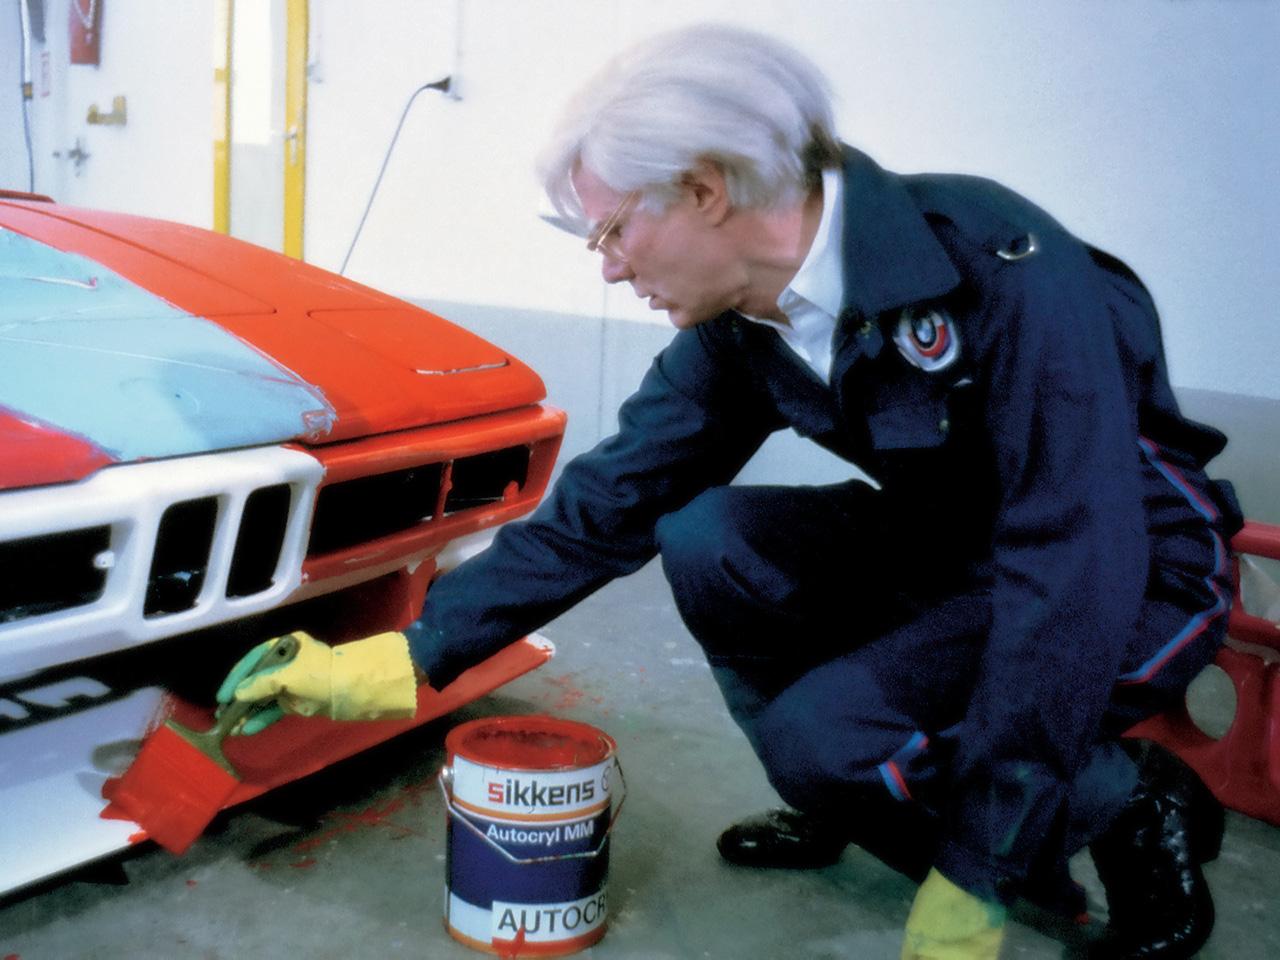 http://2.bp.blogspot.com/-WiSsfFZf6N4/T7k6eNj5IYI/AAAAAAAABUE/-_1z4etodcA/s1600/1979-BMW-M1-Art-Car-by-Andy-Warhol-Andy-Warhol-Painting-1280x960.jpg